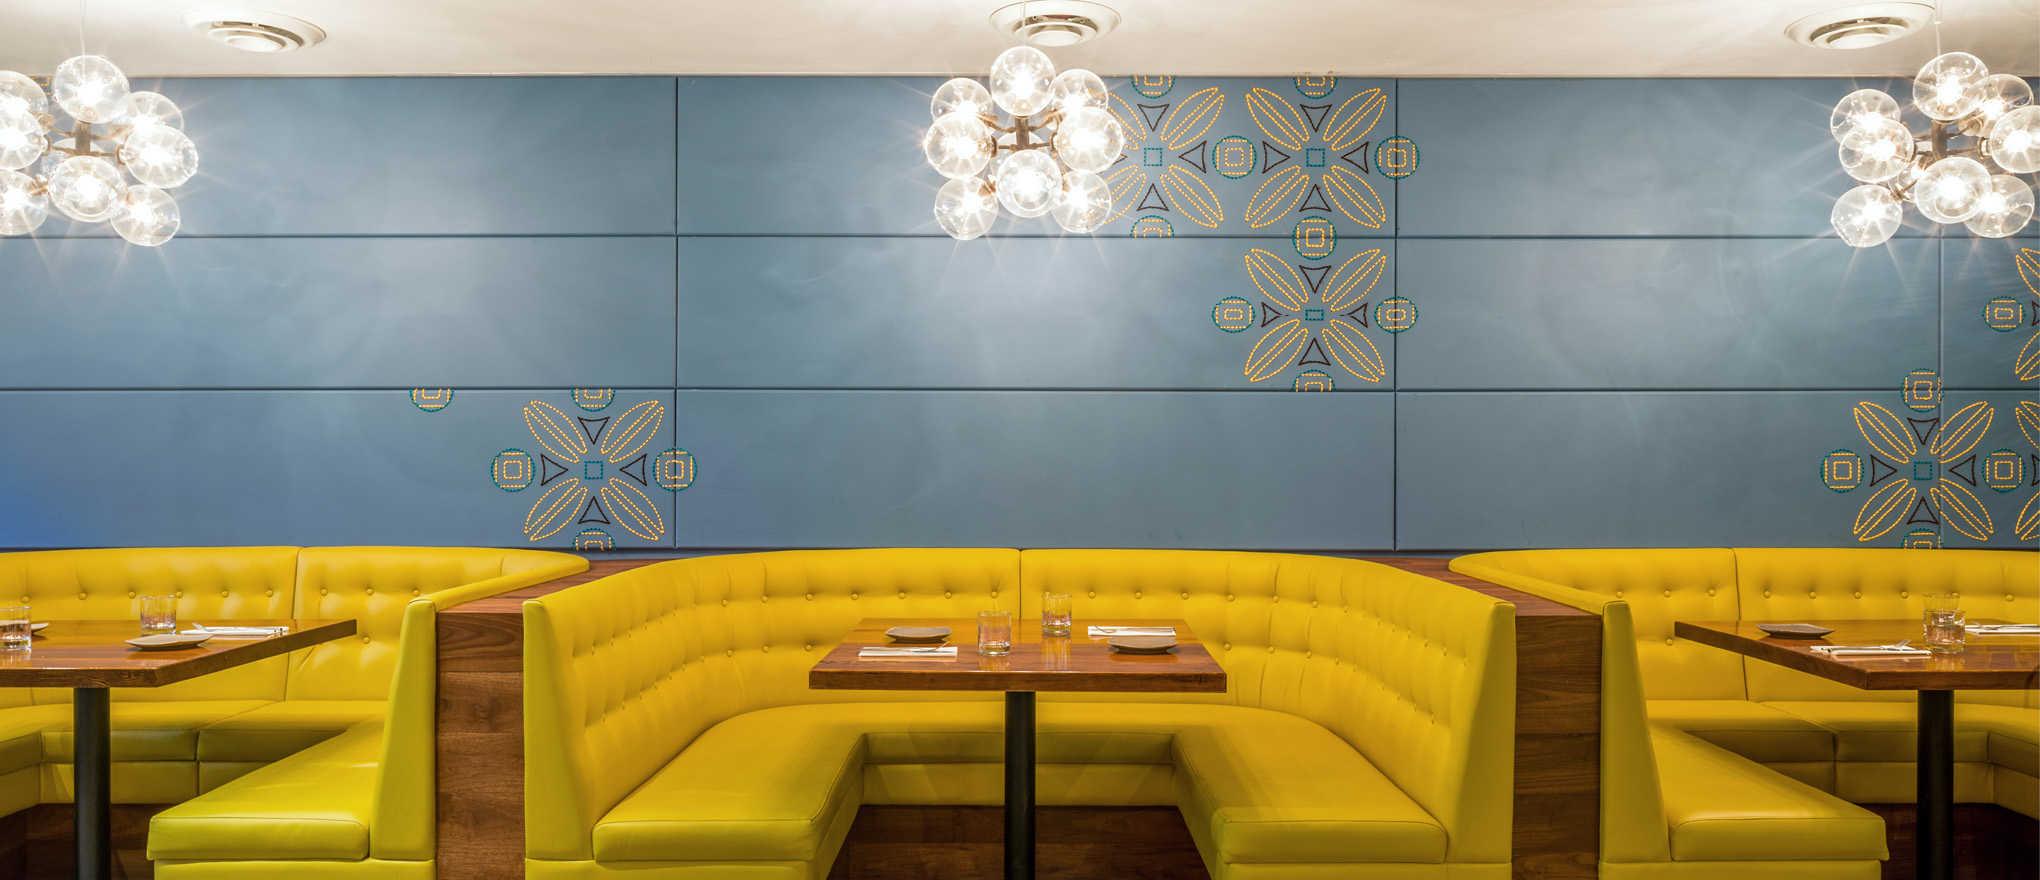 Tips for restaurant interior design space harmony - Harmony in interior design ...